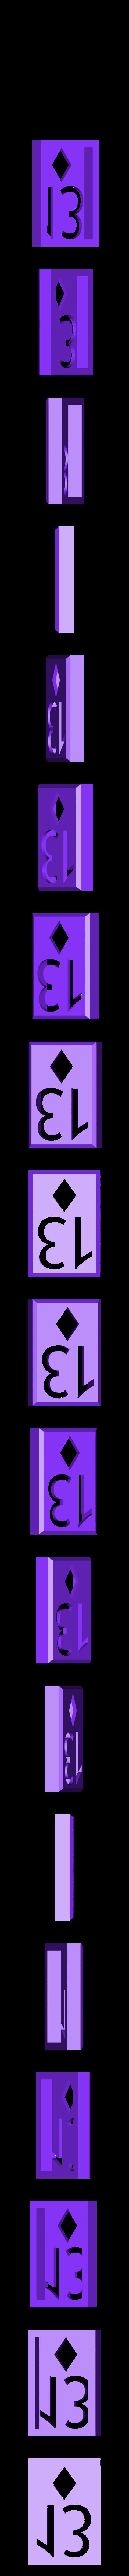 BlockDiamonds13.stl Download STL file Playing Card Tiles • Object to 3D print, Jinja